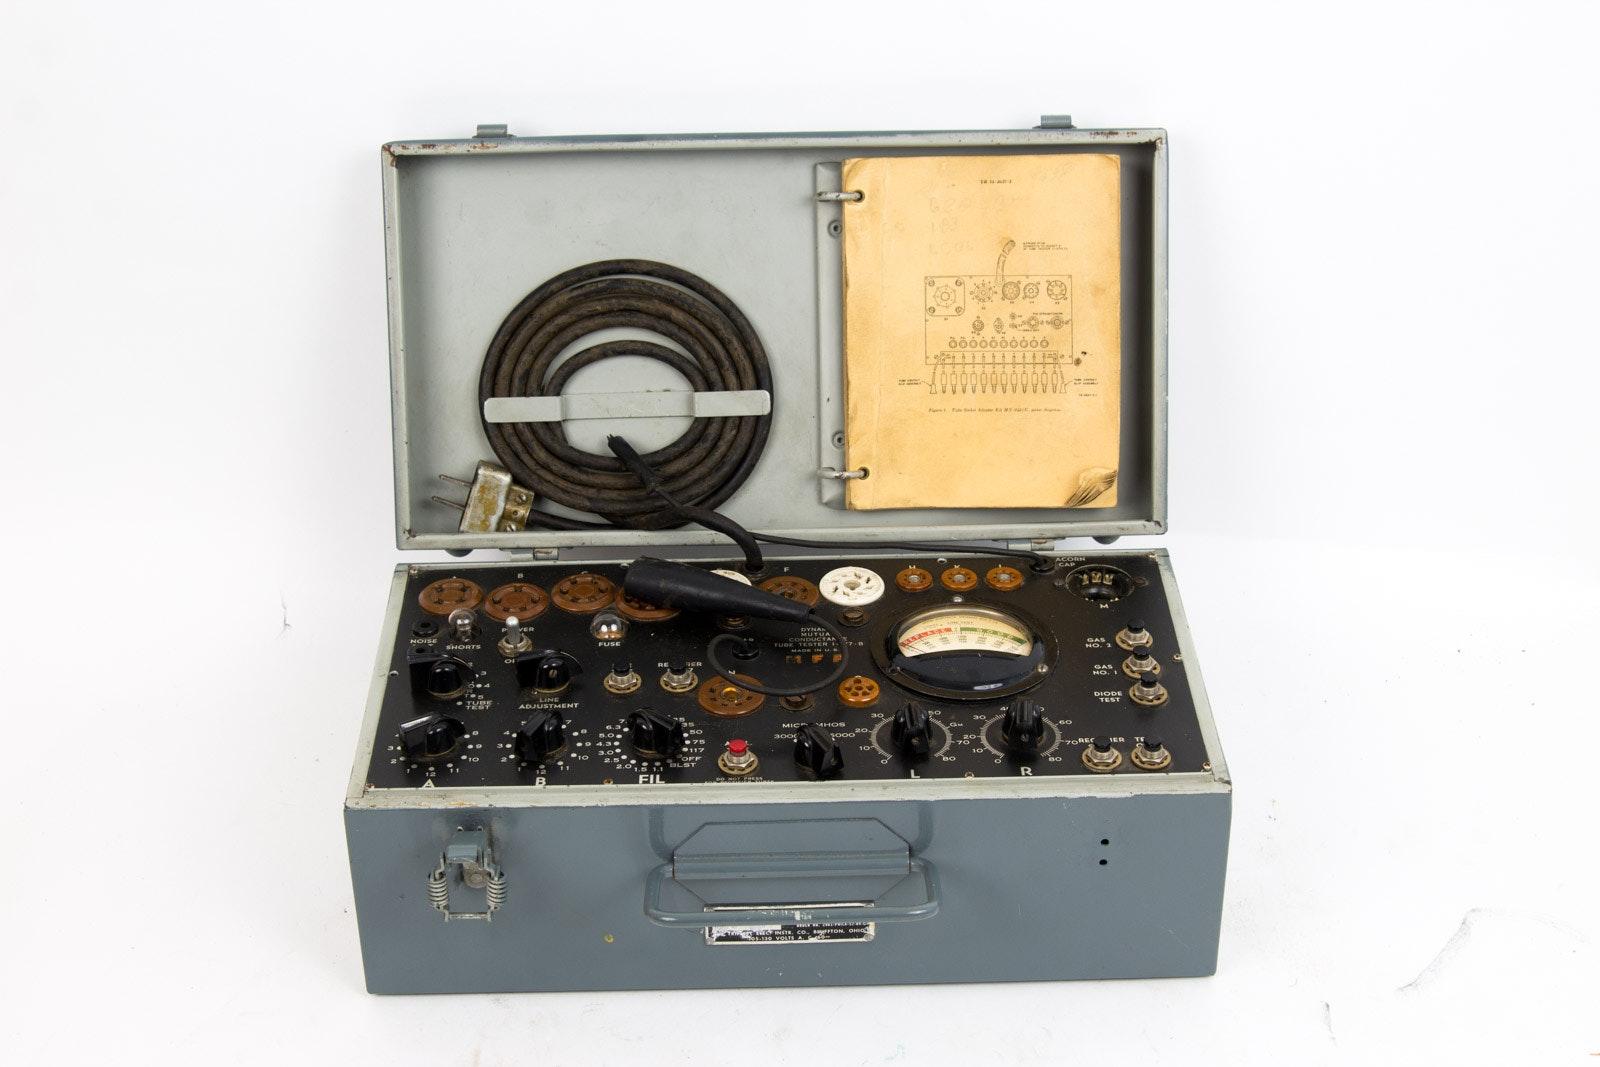 Signal Corp Tube Tester Model 1-77-B